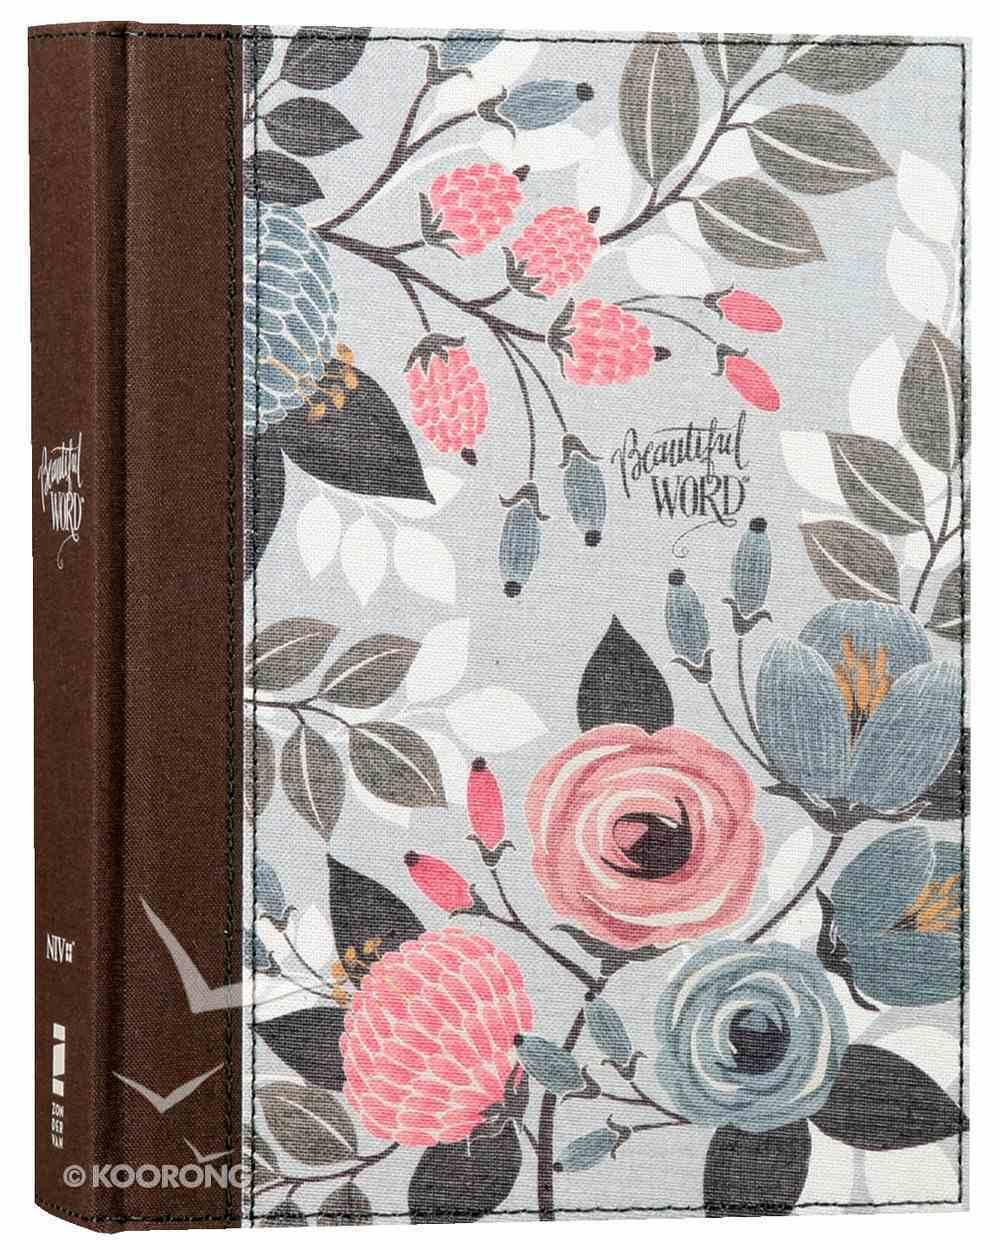 NIV Beautiful Word Bible Floral (Black Letter Edition) Hardback